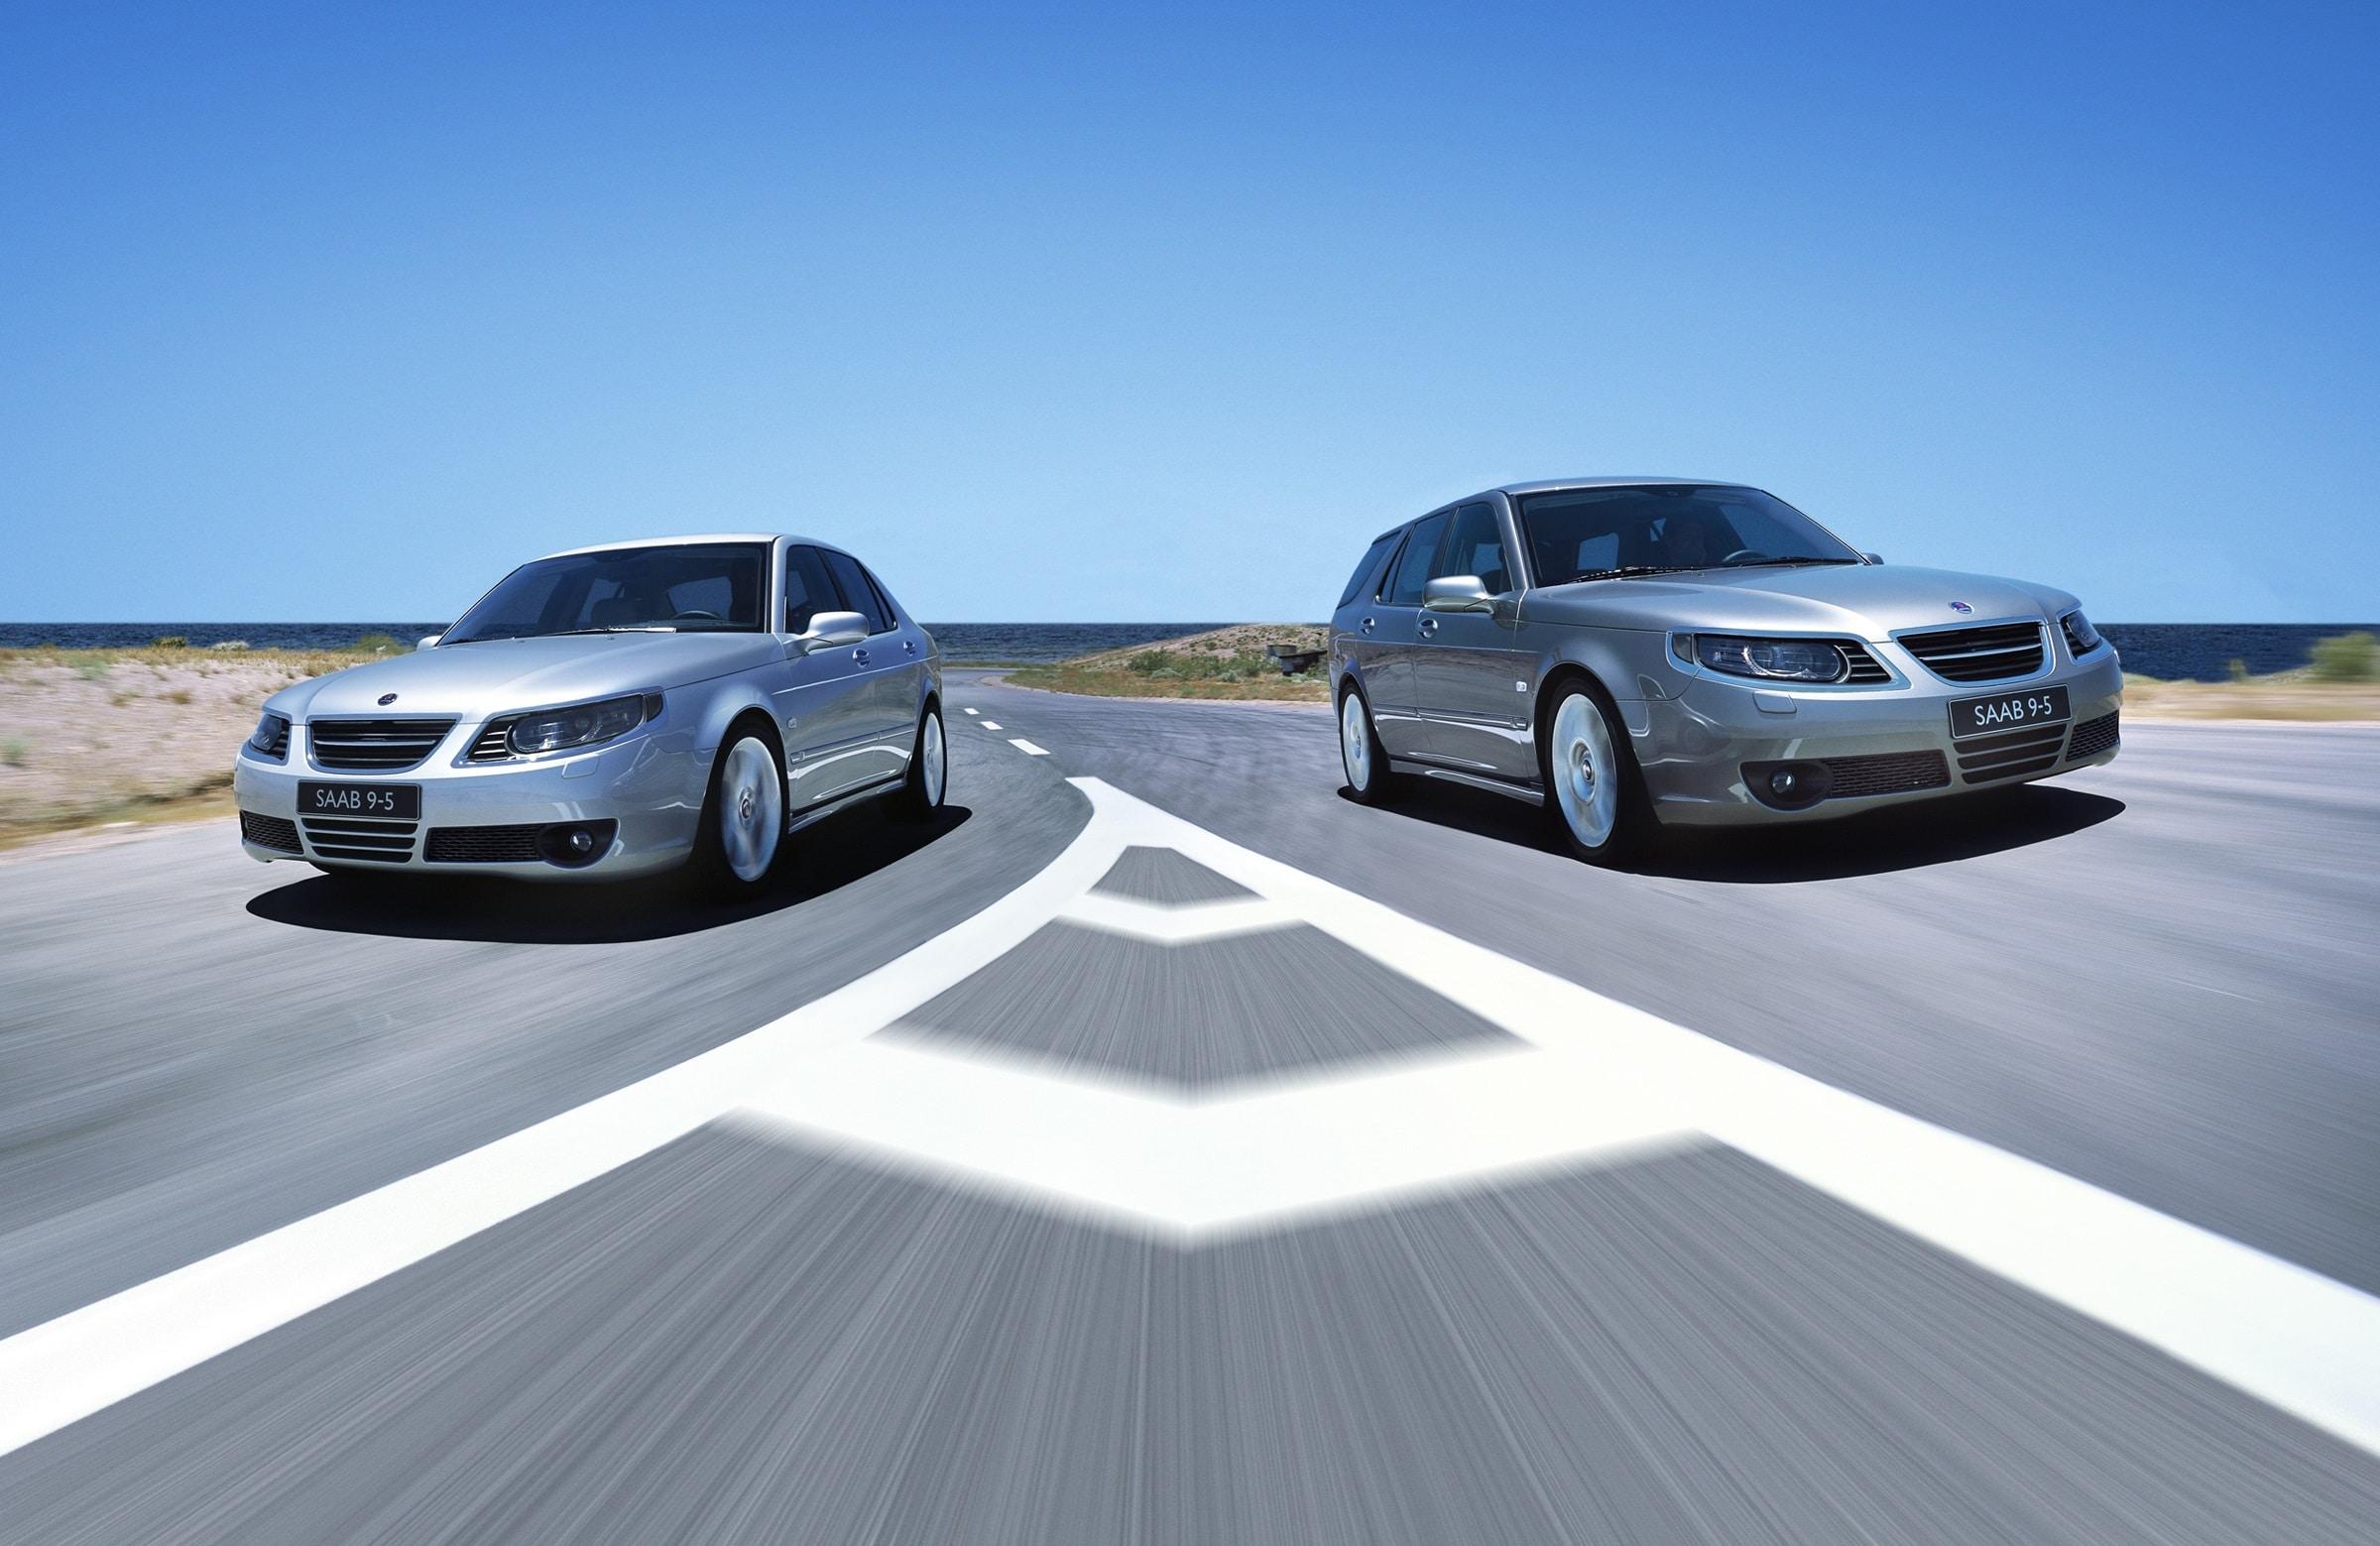 Saab The Wonderful Swedish Motoring Oddity You Should